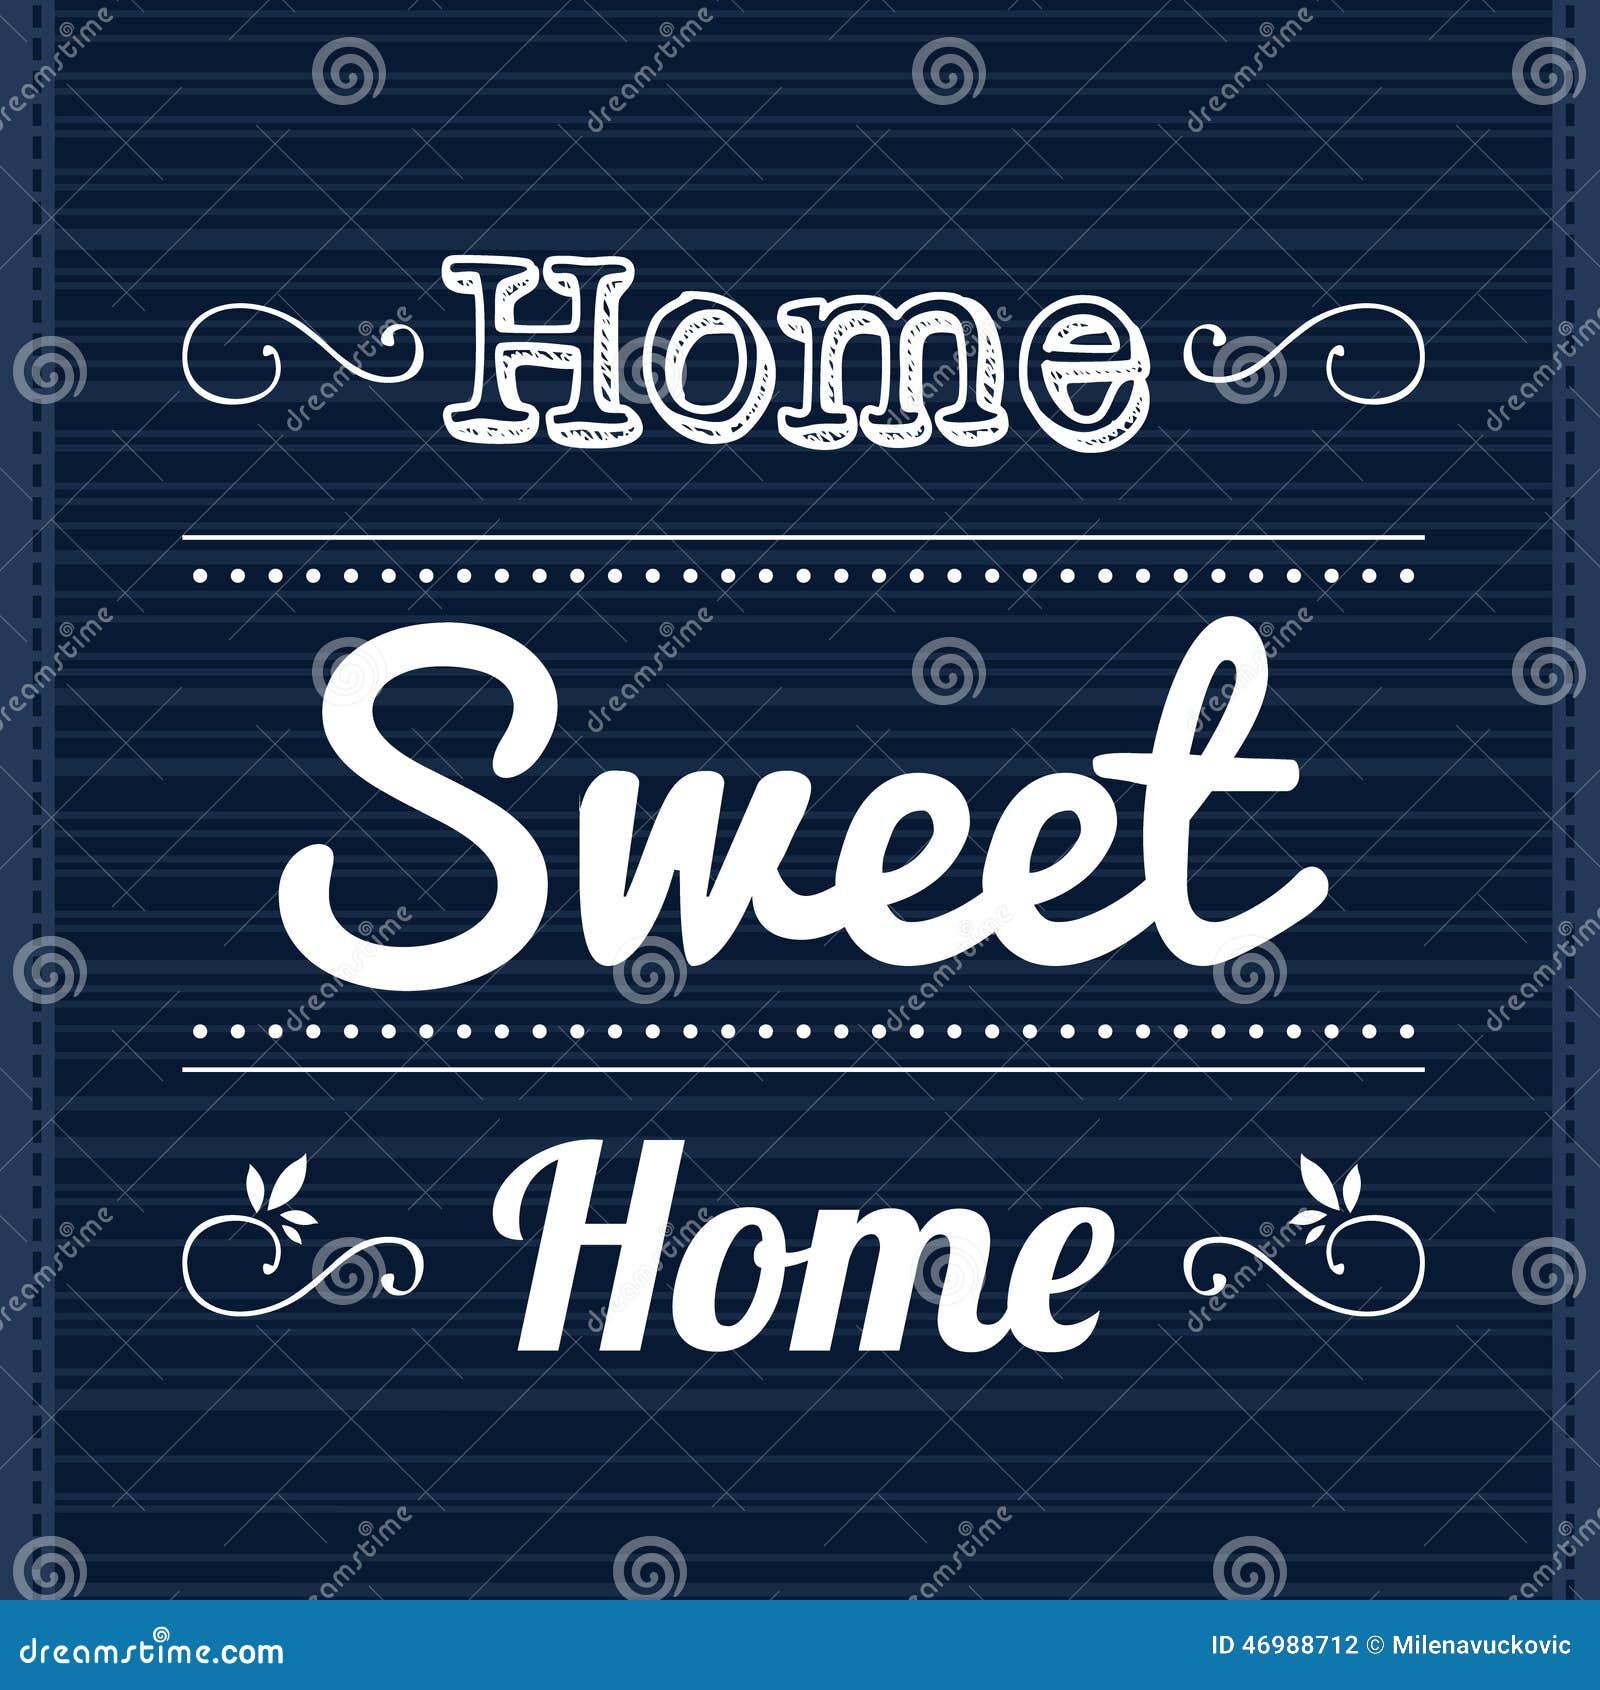 Slogan Home Sweet Home Stock Vector - Image: 46988712